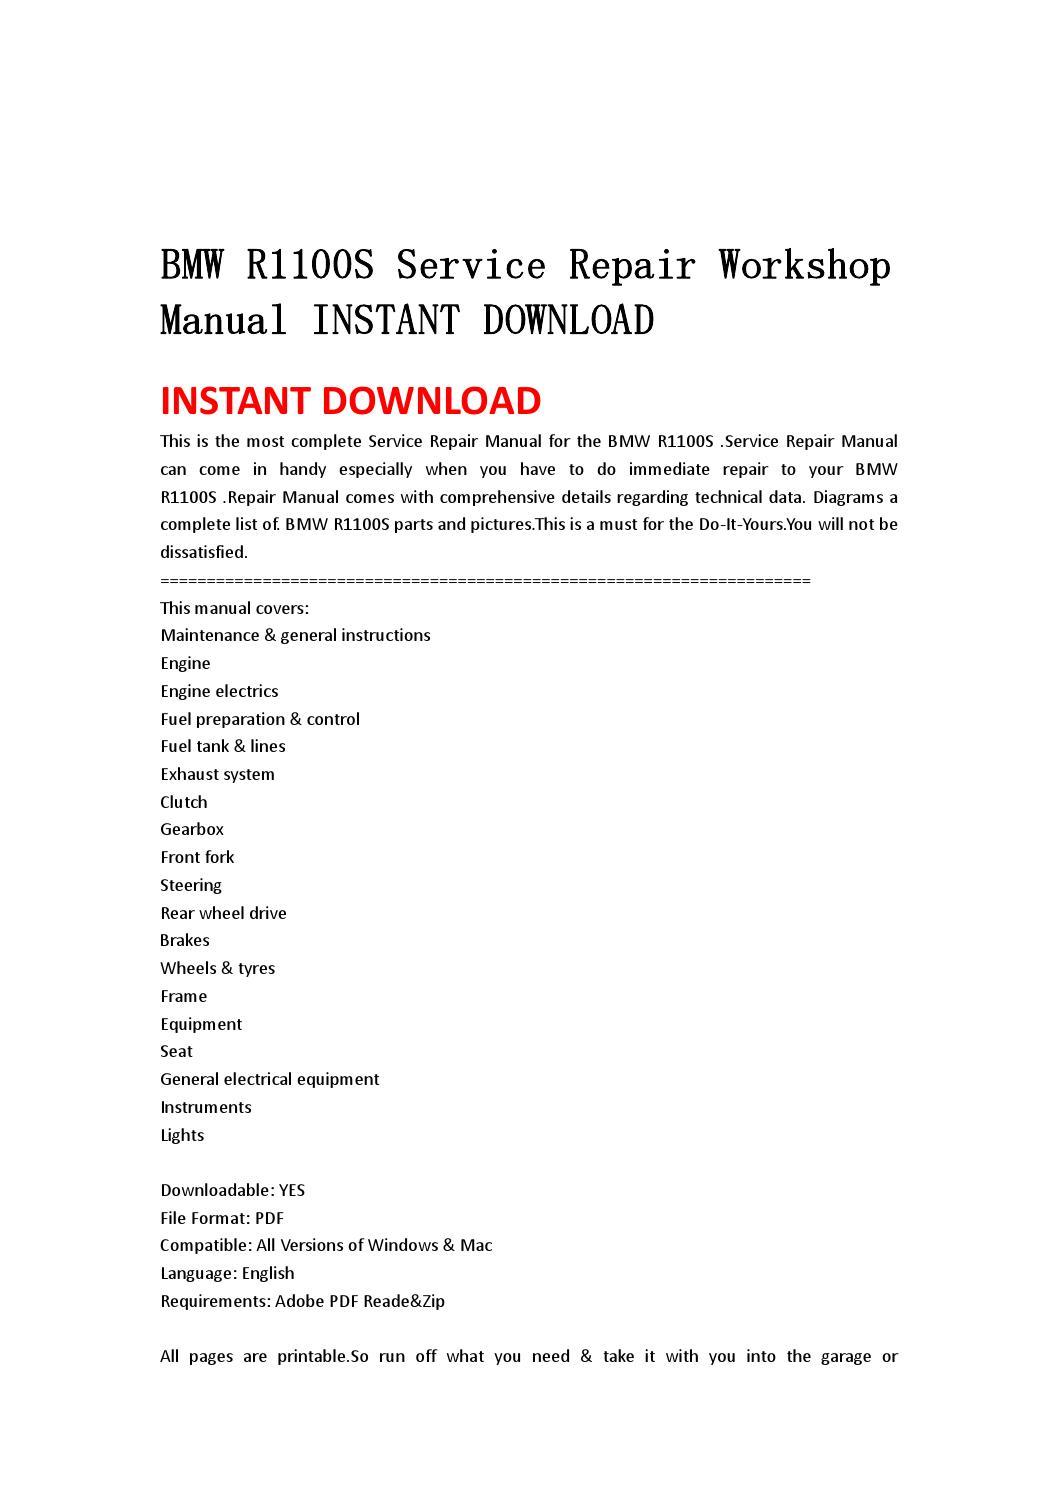 Bmw r1100s service repair workshop manual instant download by fdhgsbefhnn -  issuu